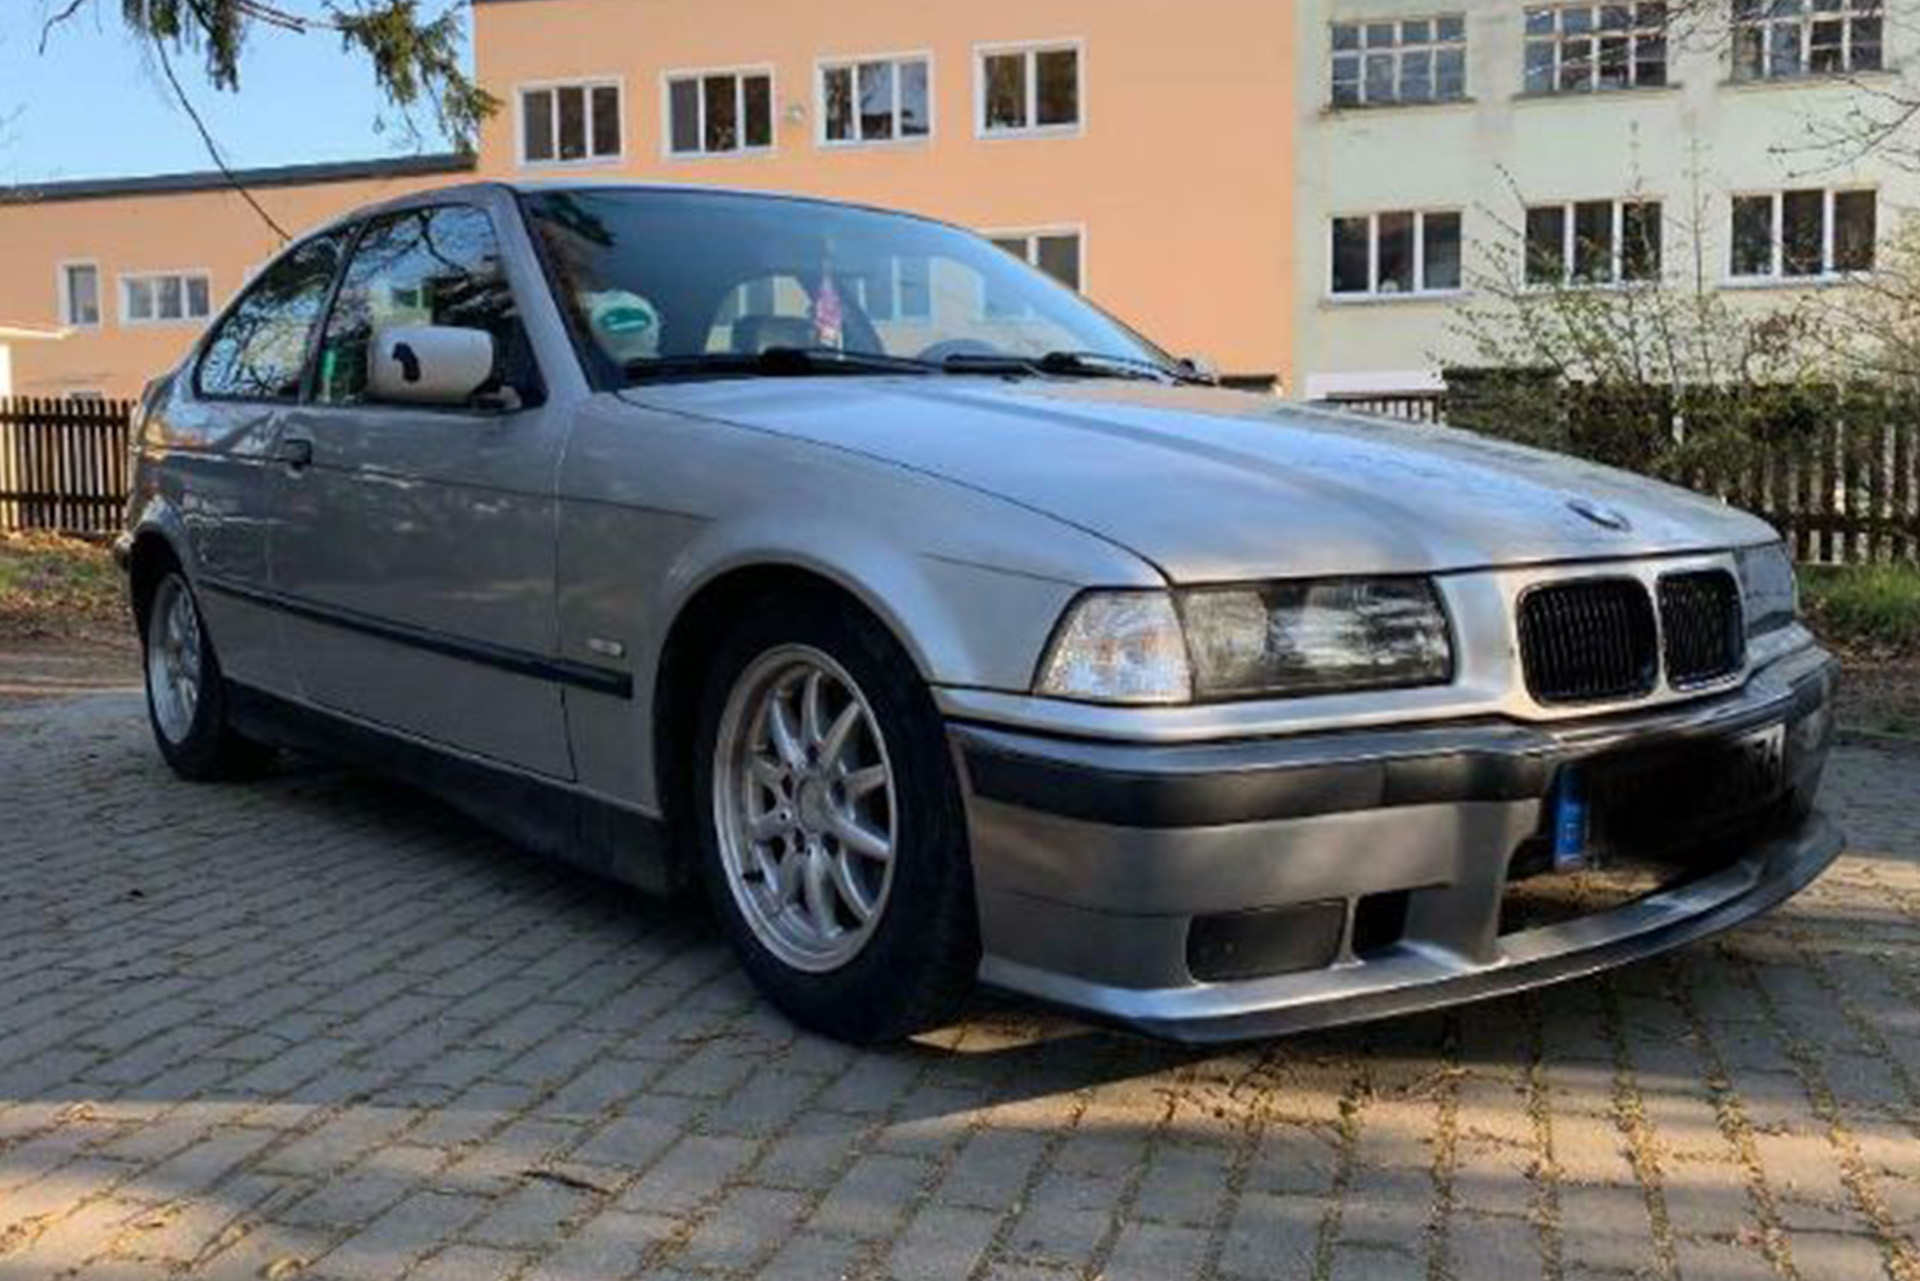 GARC - Auto Racing Club Grafenwöhr